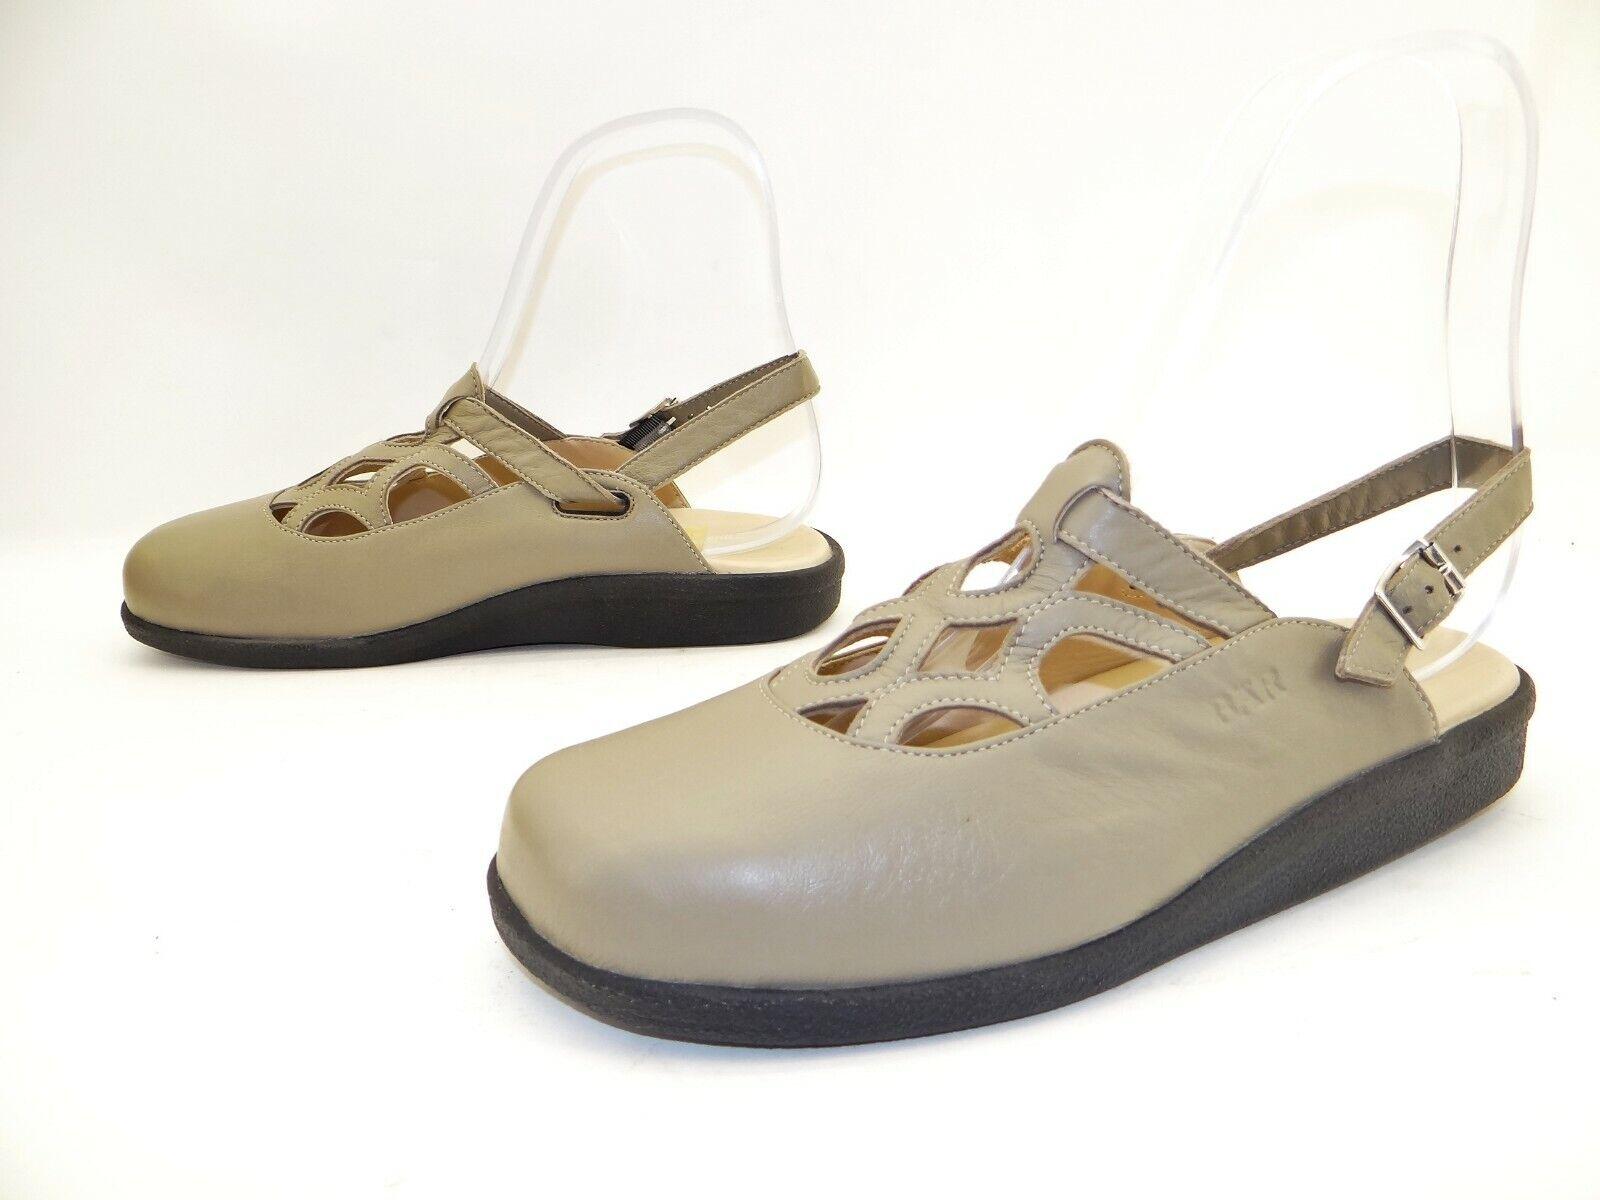 BÄR Damen Sommer Schuhe Ballerinas Pantoletten Sandalen Barfuß Gr. 41,5  UK  7,5